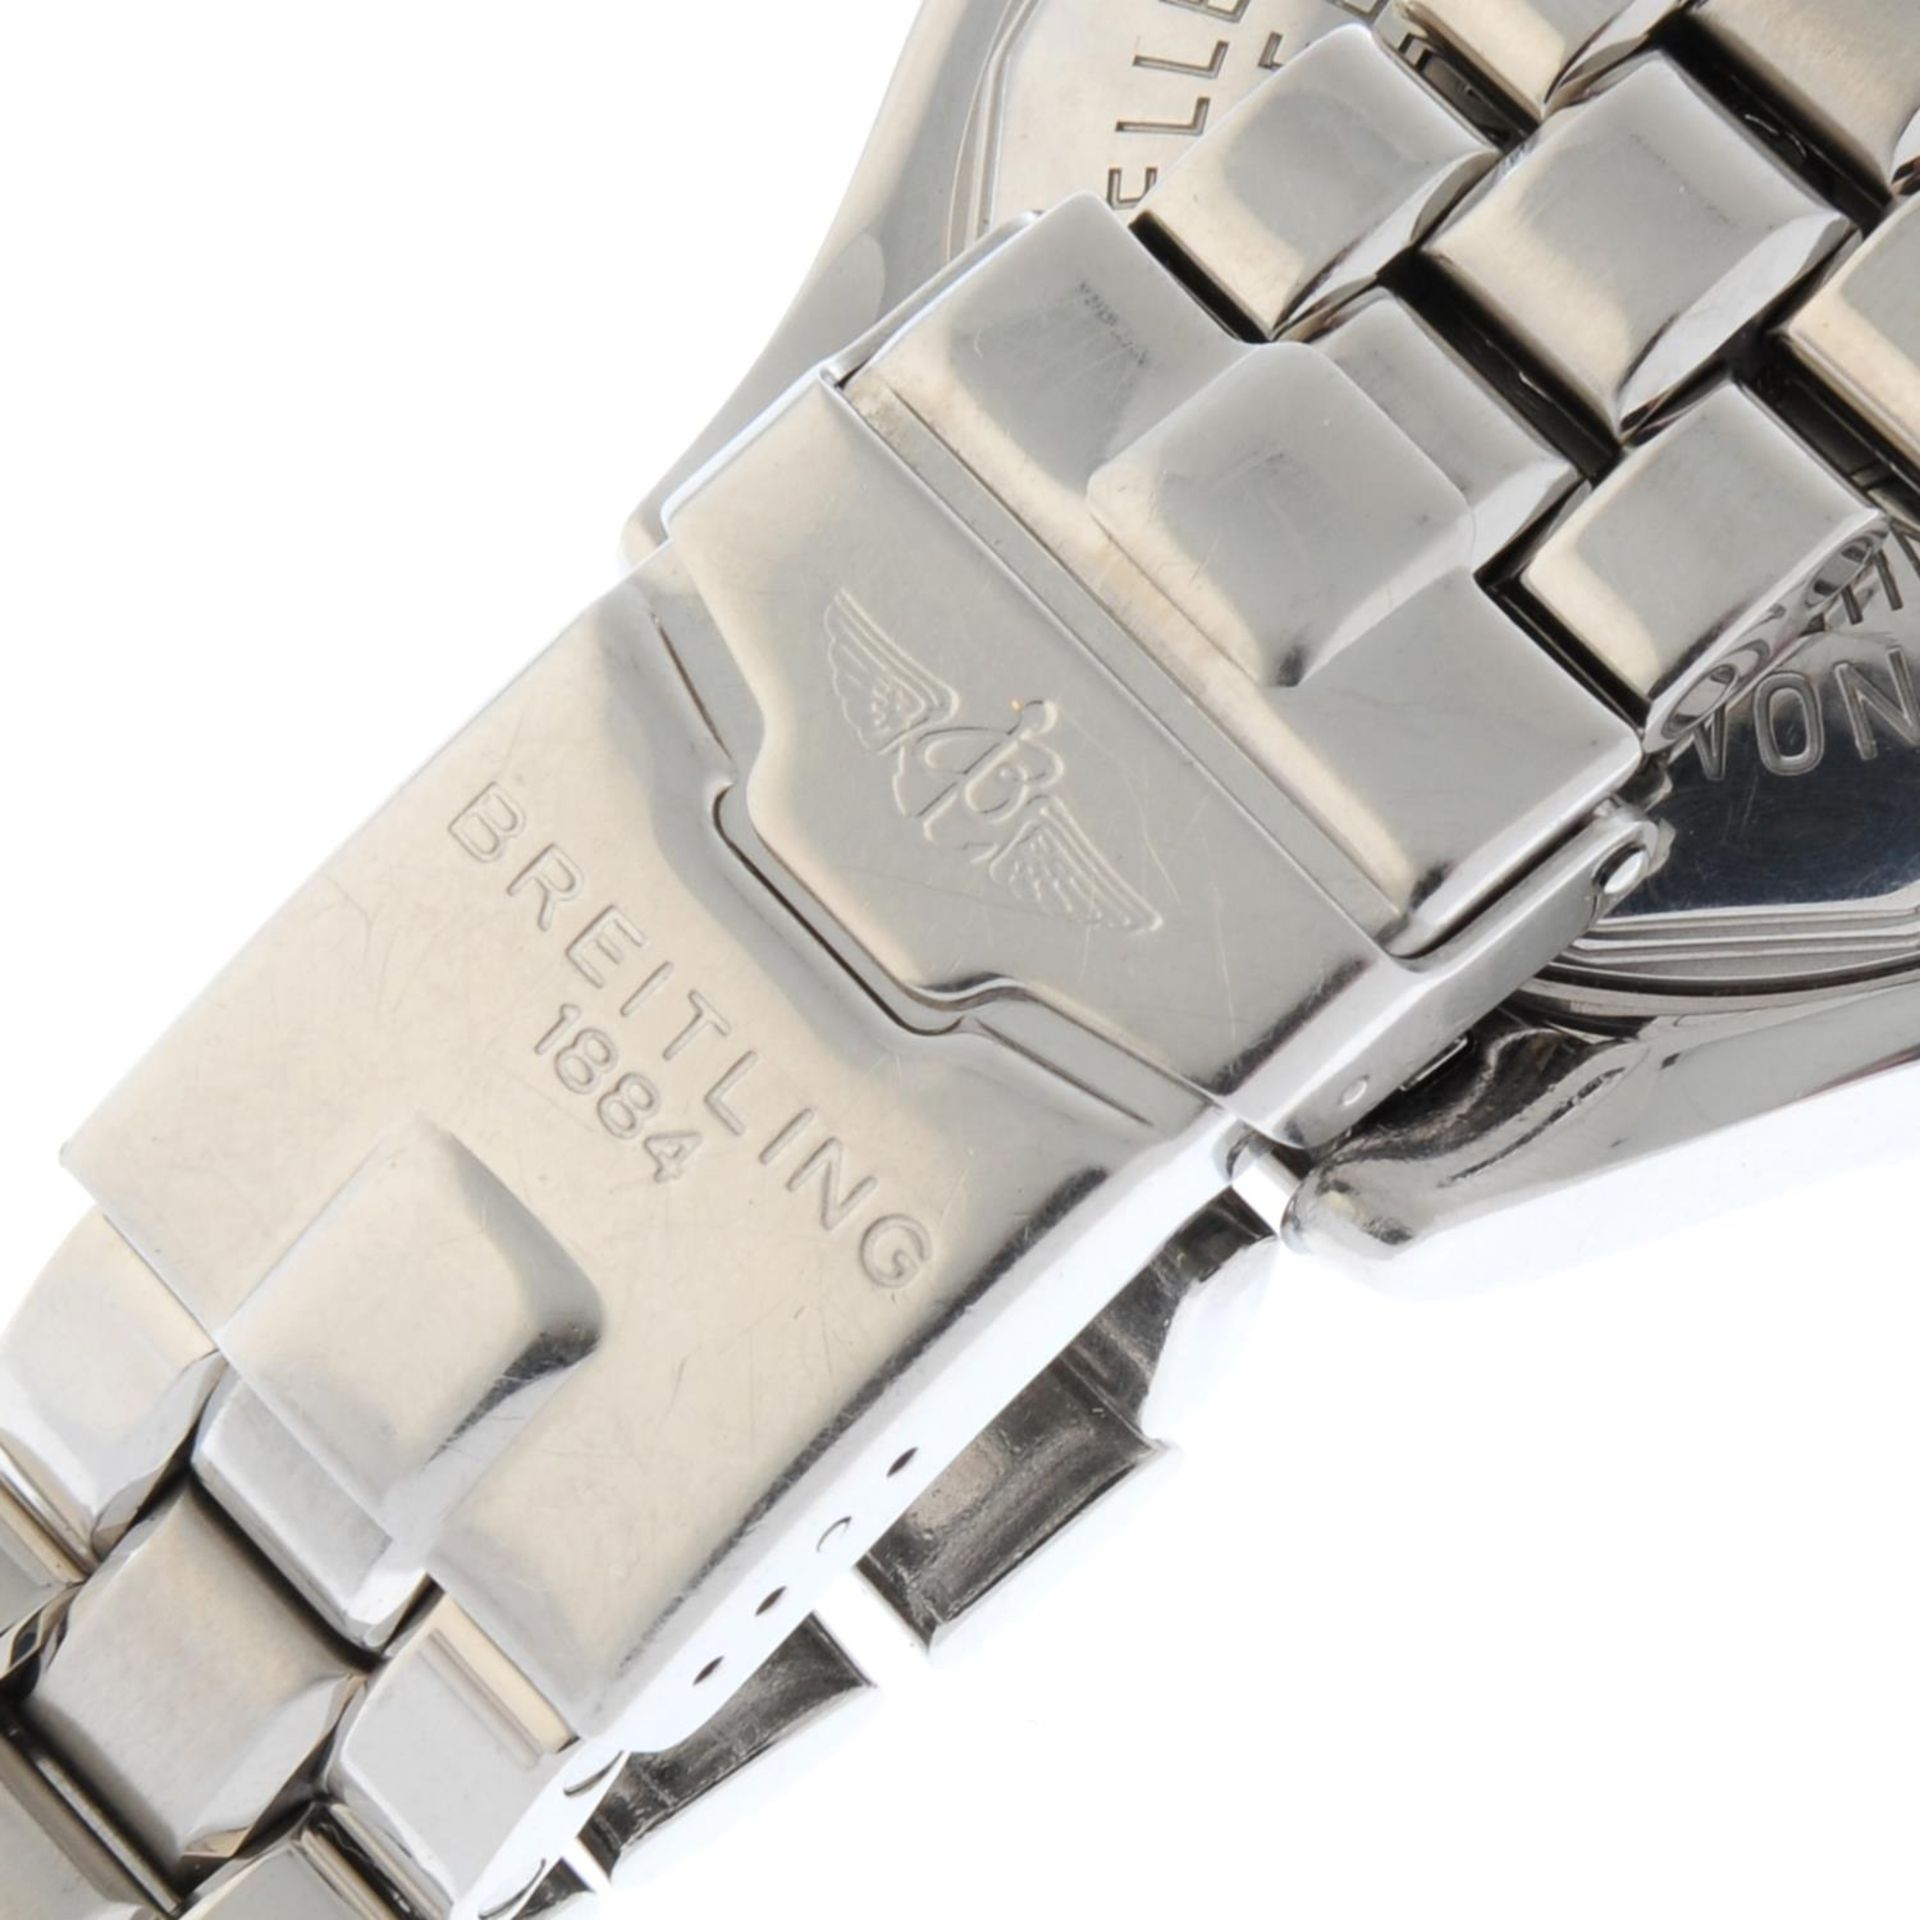 BREITLING - a SuperOcean bracelet watch. - Bild 2 aus 5